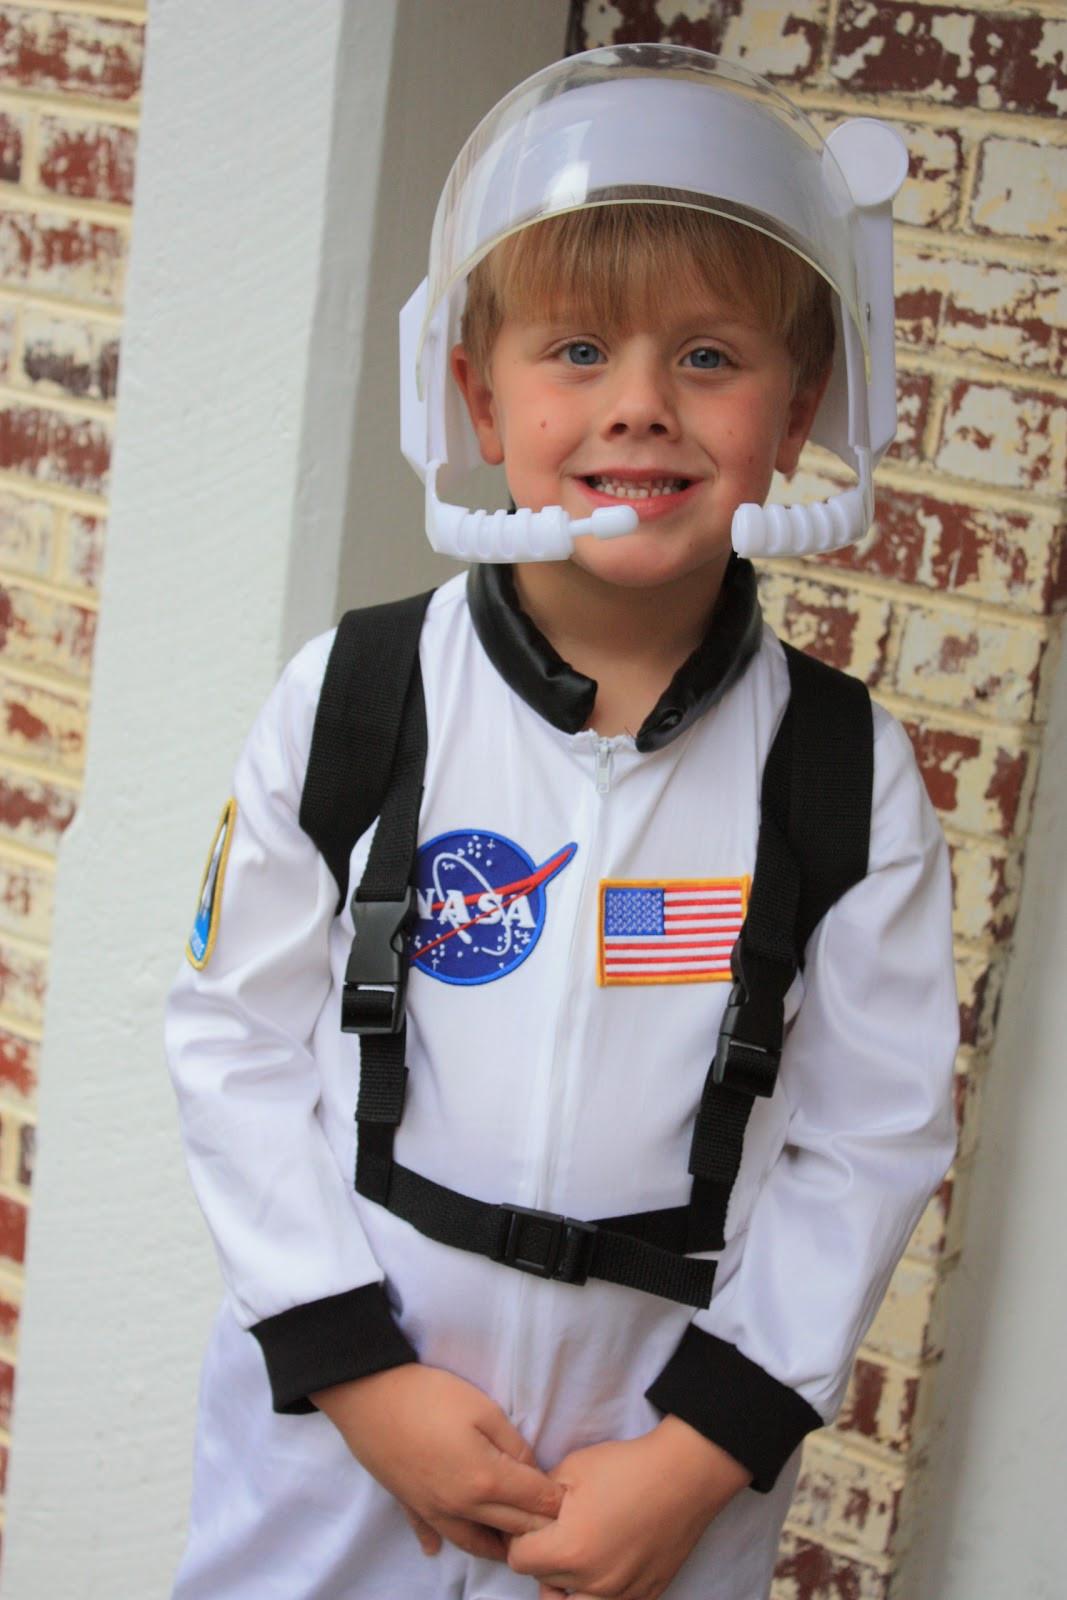 DIY Kids Astronaut Costume  alton boys Costumes & Crafts